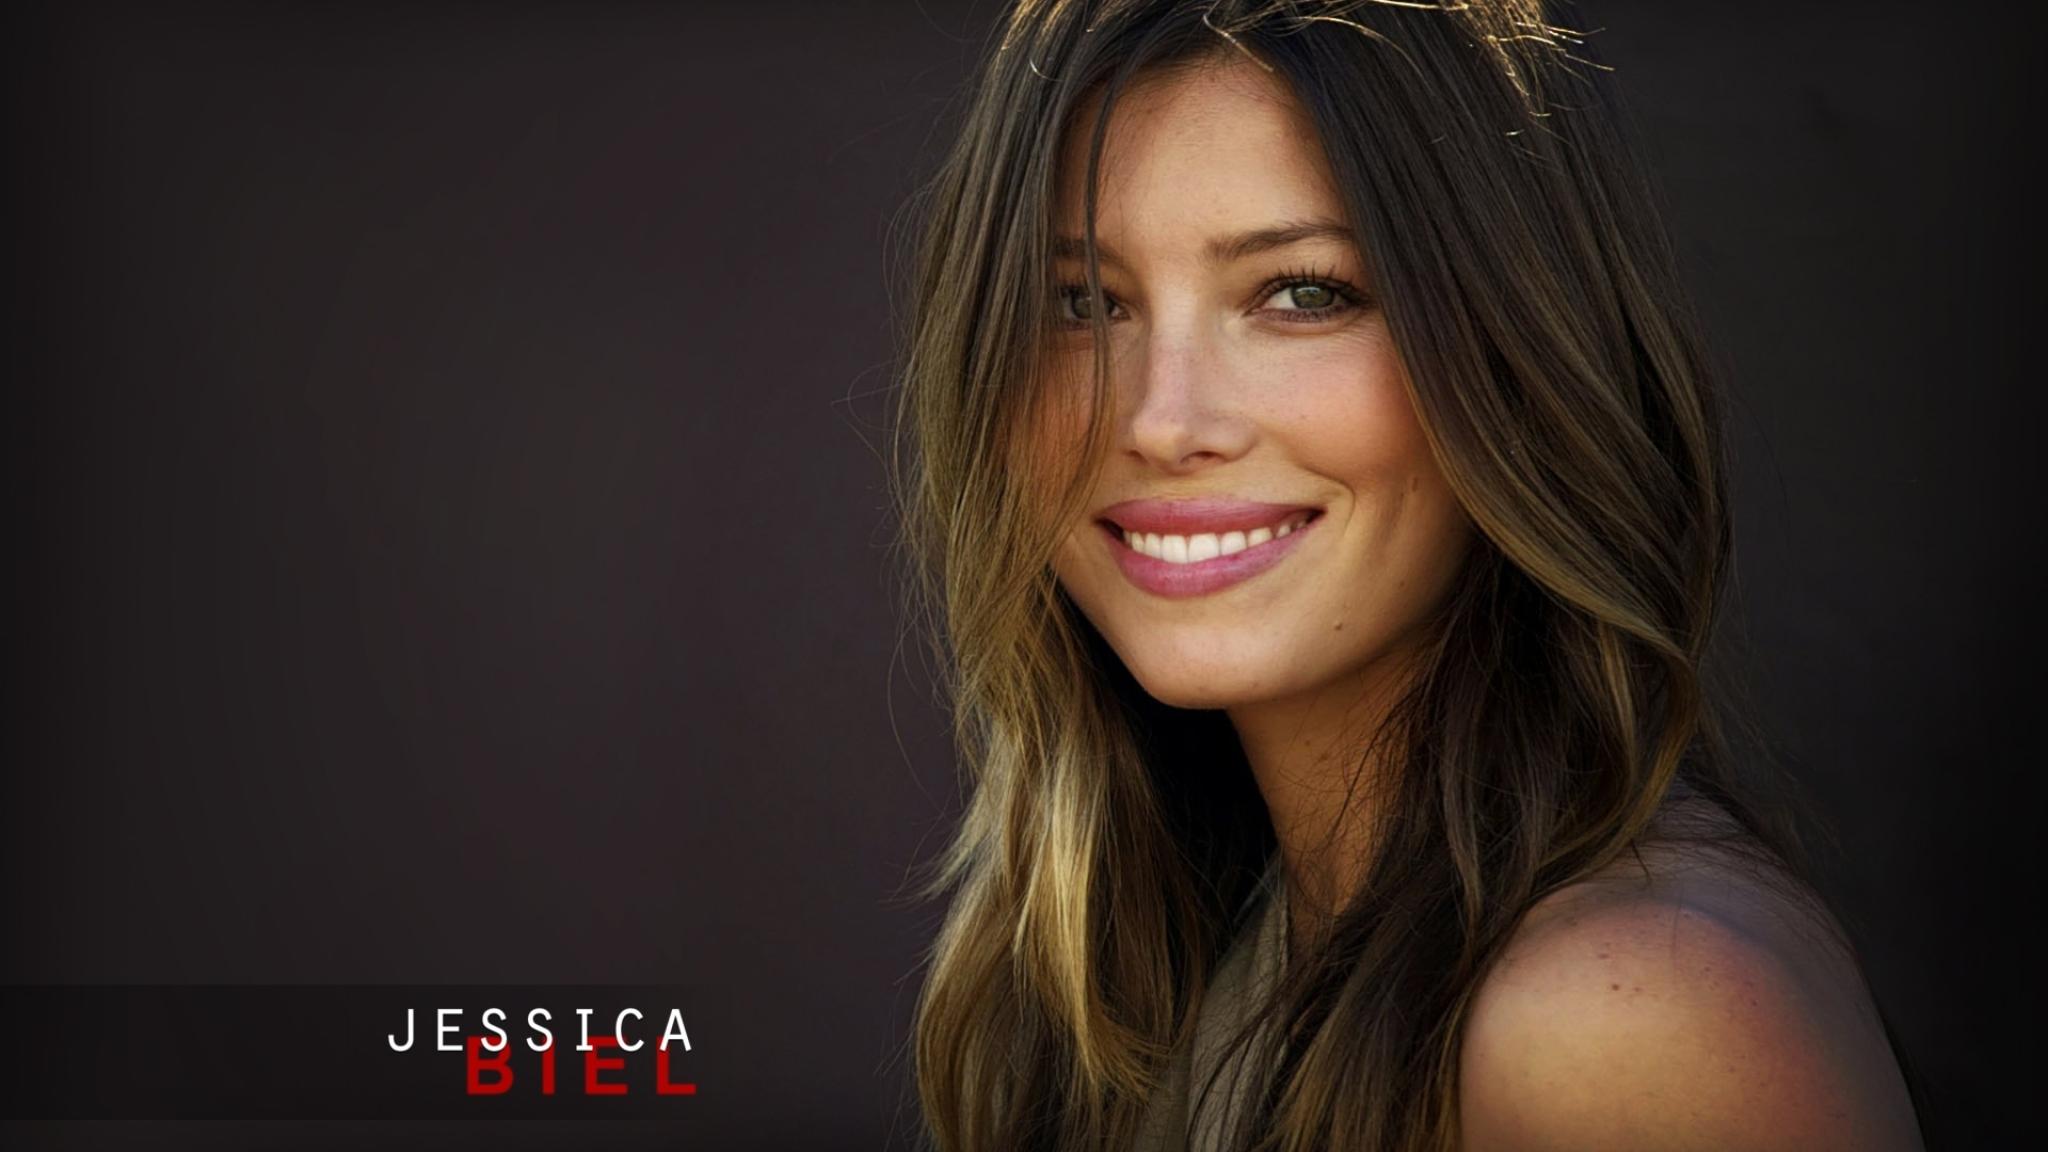 Jessica Biel Smile Poster  Full Hd Wallpaper